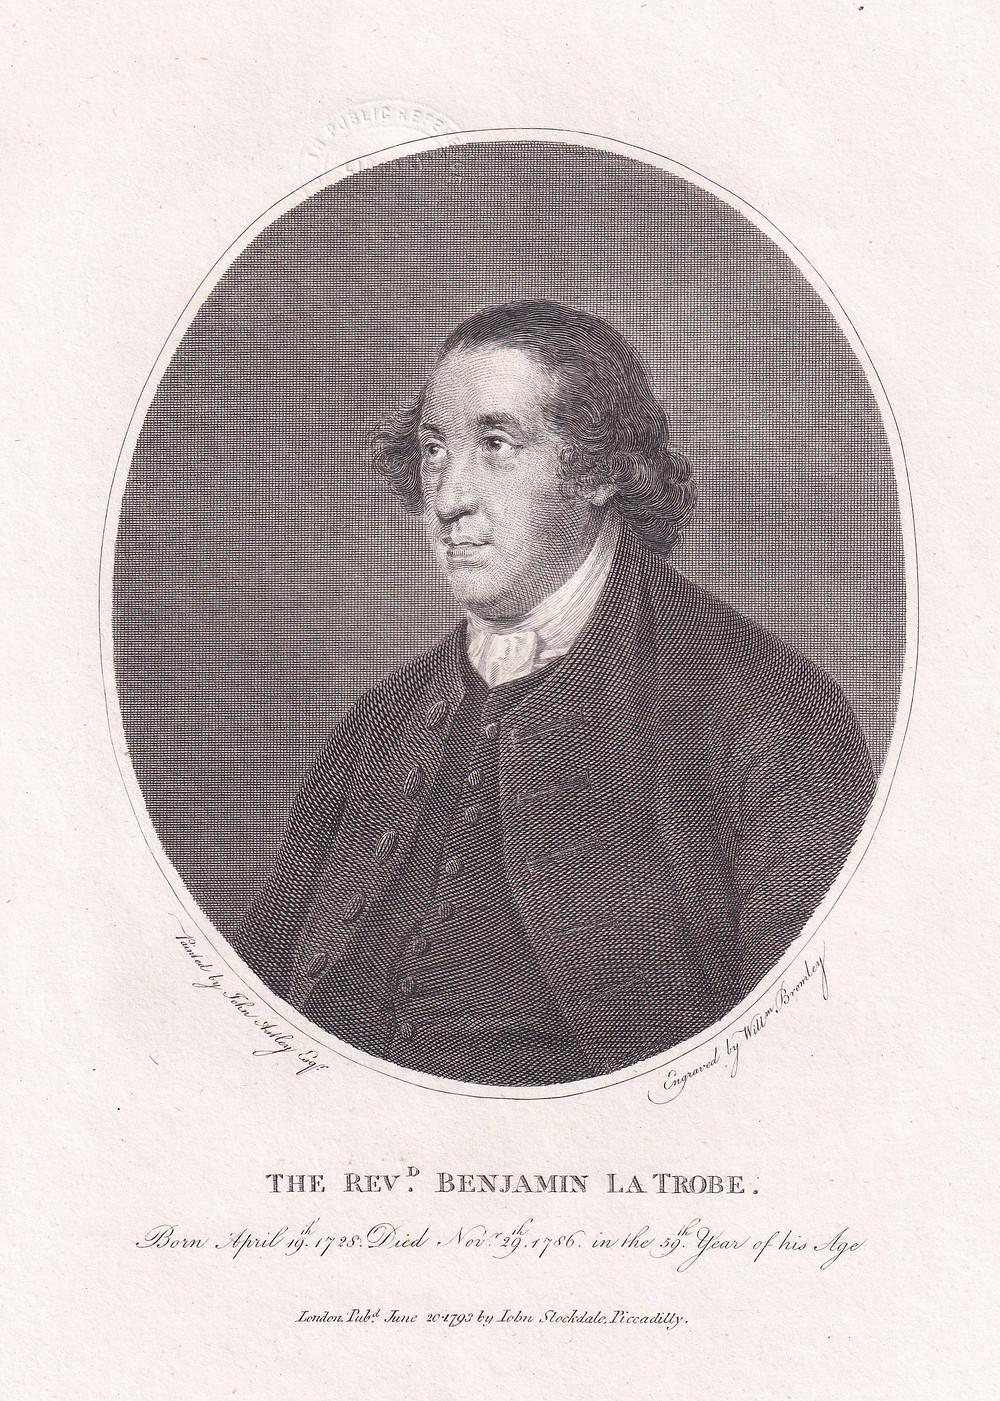 Figure 1: Benjamin LaTrobe (1728-1786), head of the Moravians in Great Britain since 1768.